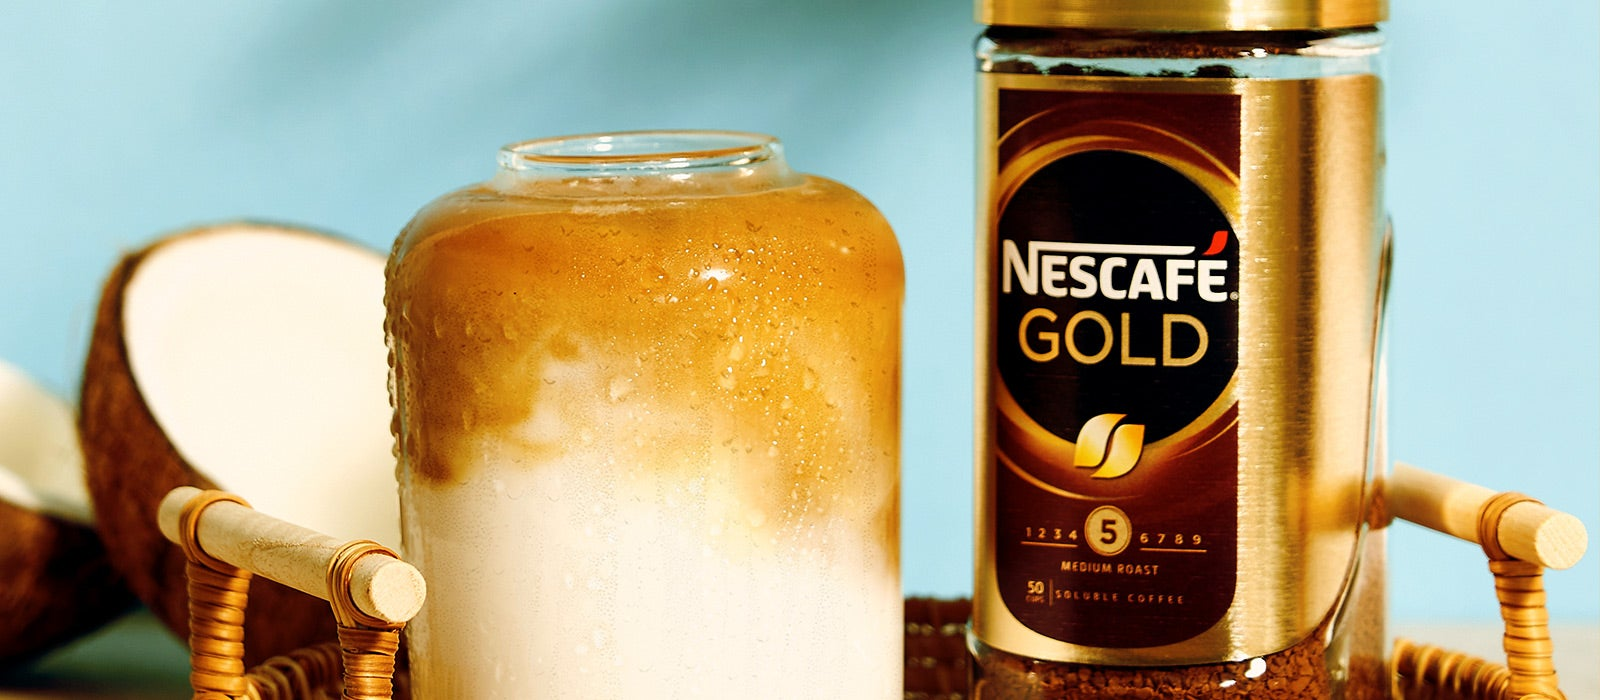 nescafe-gold-Coconut-Milk-Latte-recipe-banner_0.jpg